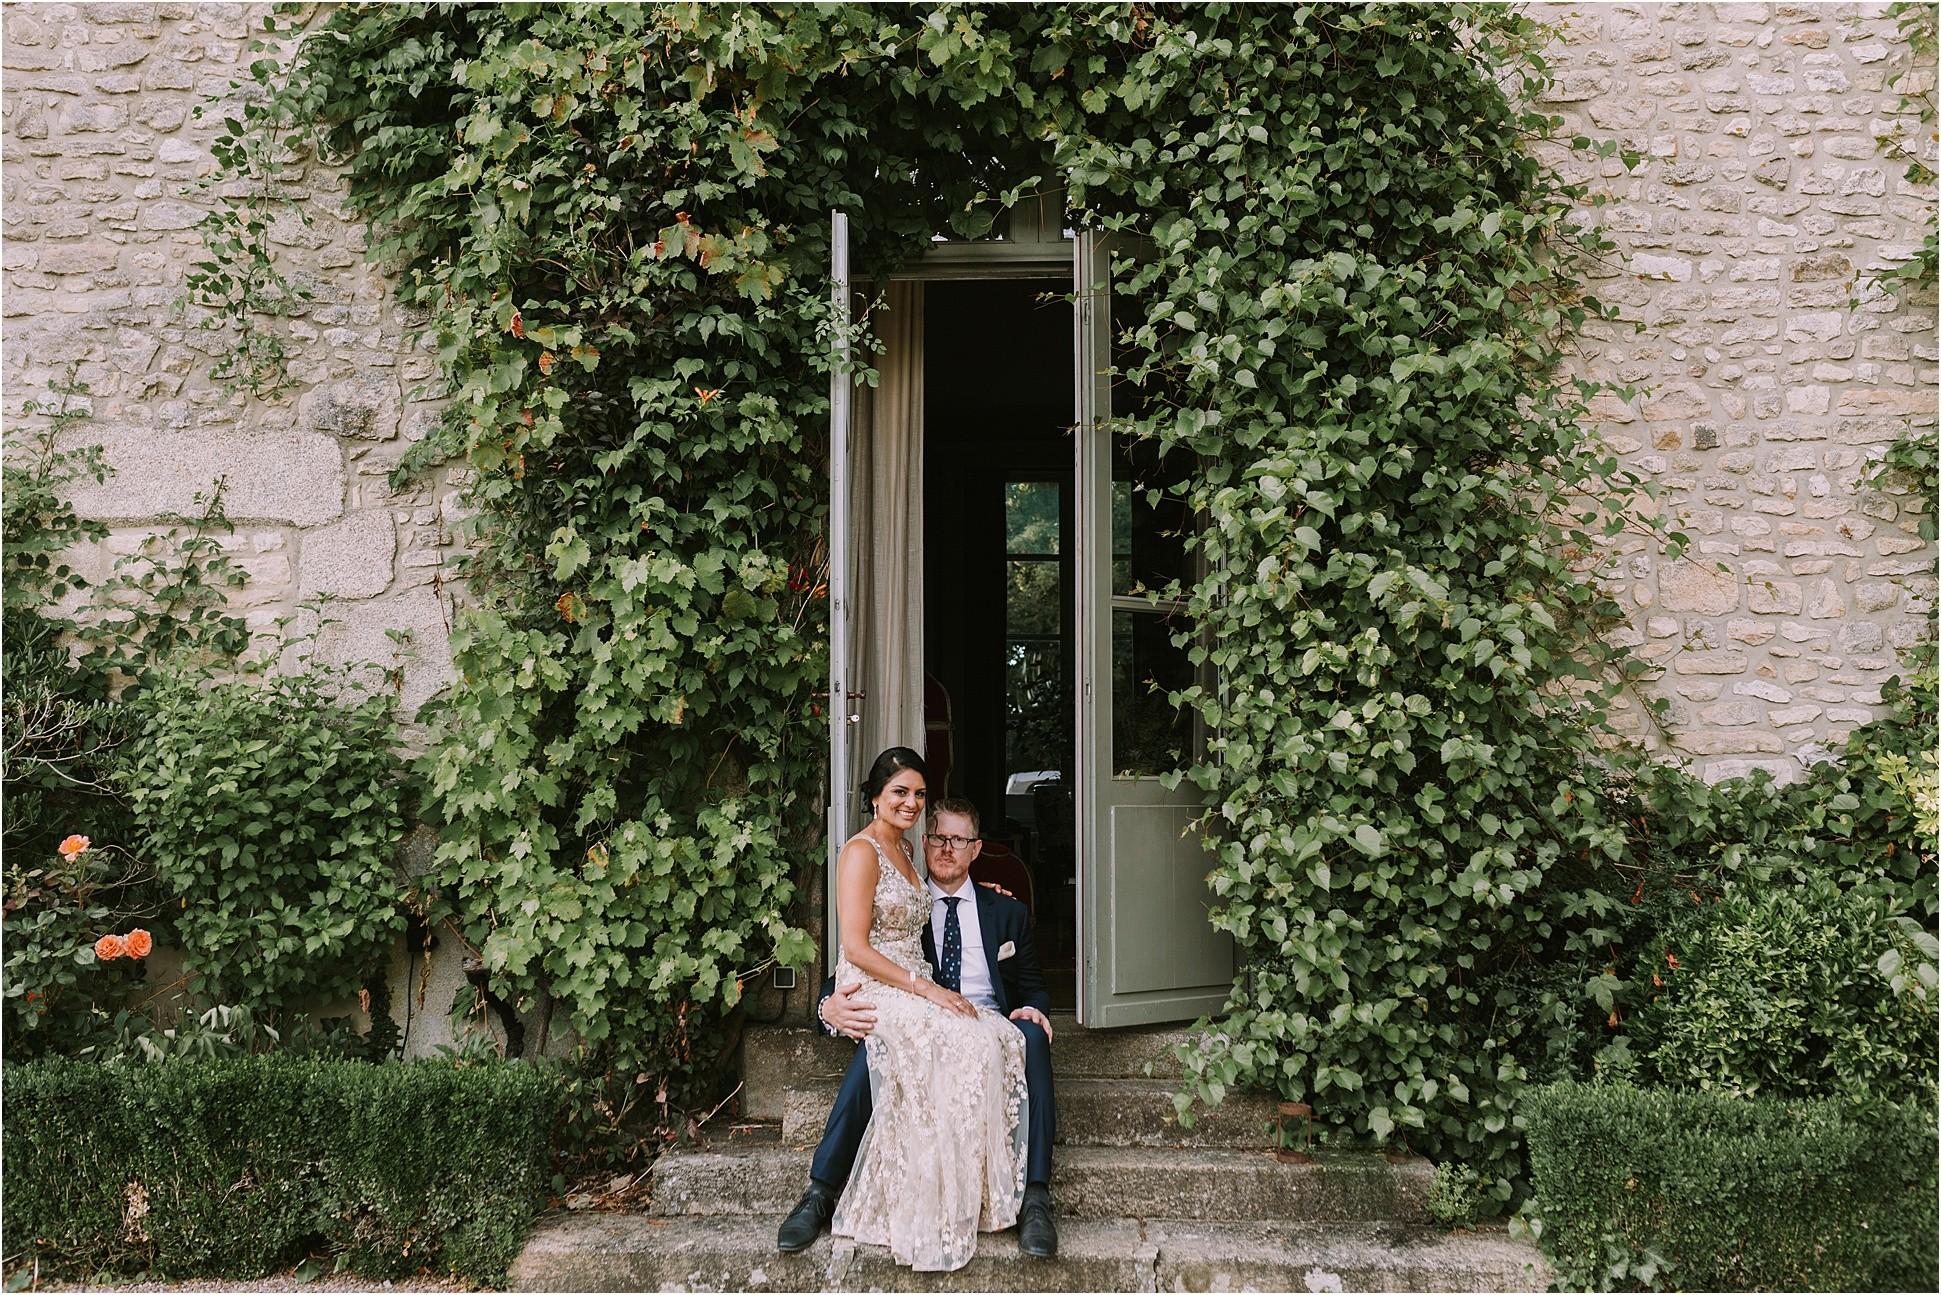 Kateryna-photos-photographe-mariage-chateau-st-paterne-mayenne-normandie_0187.jpg